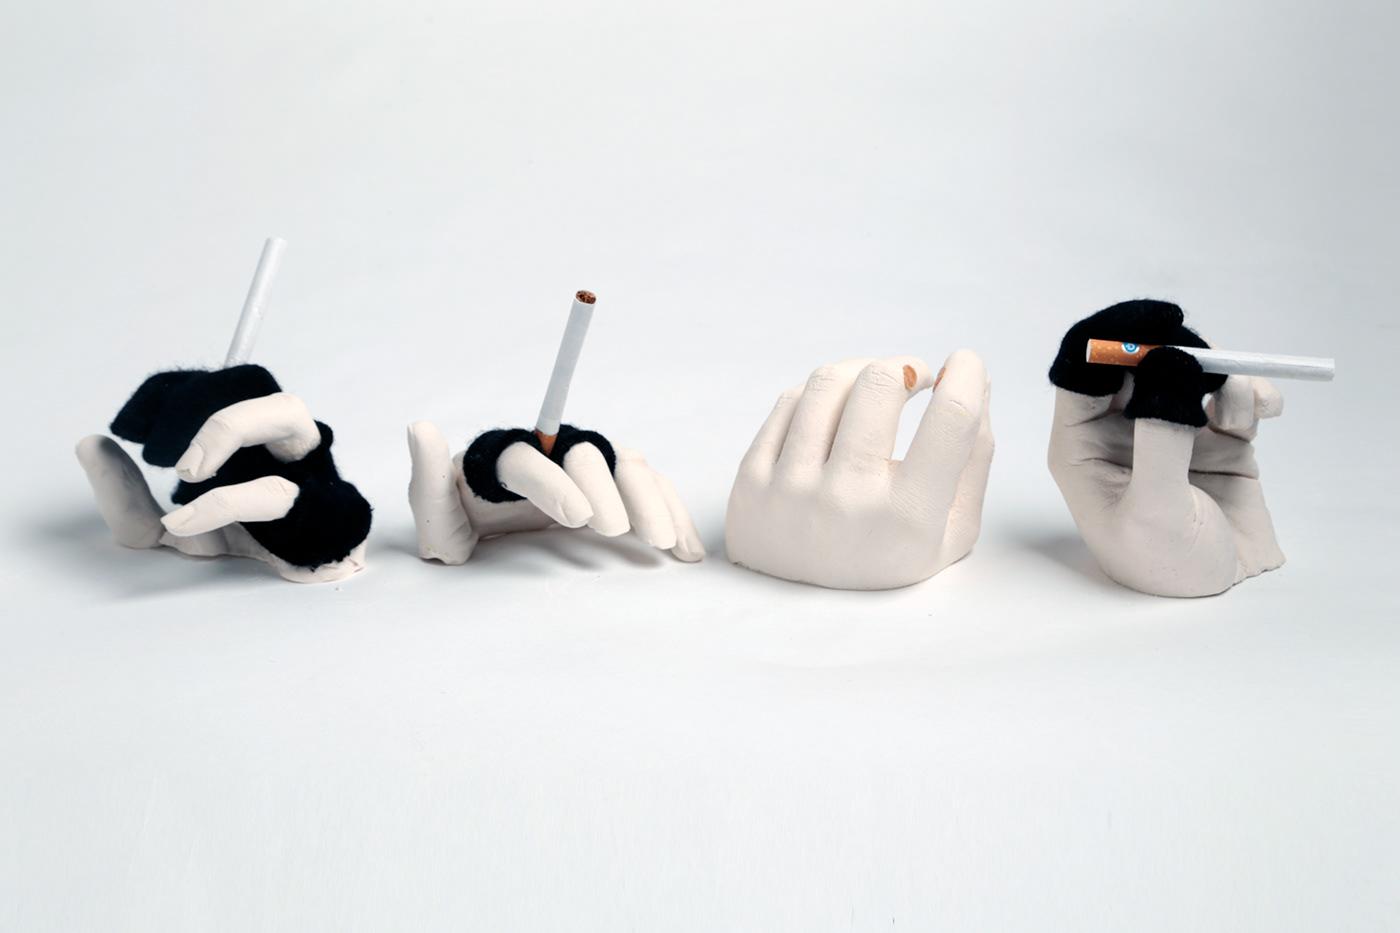 Critical Design speculative design rashes skin body SPAM luxury Body Augmentation